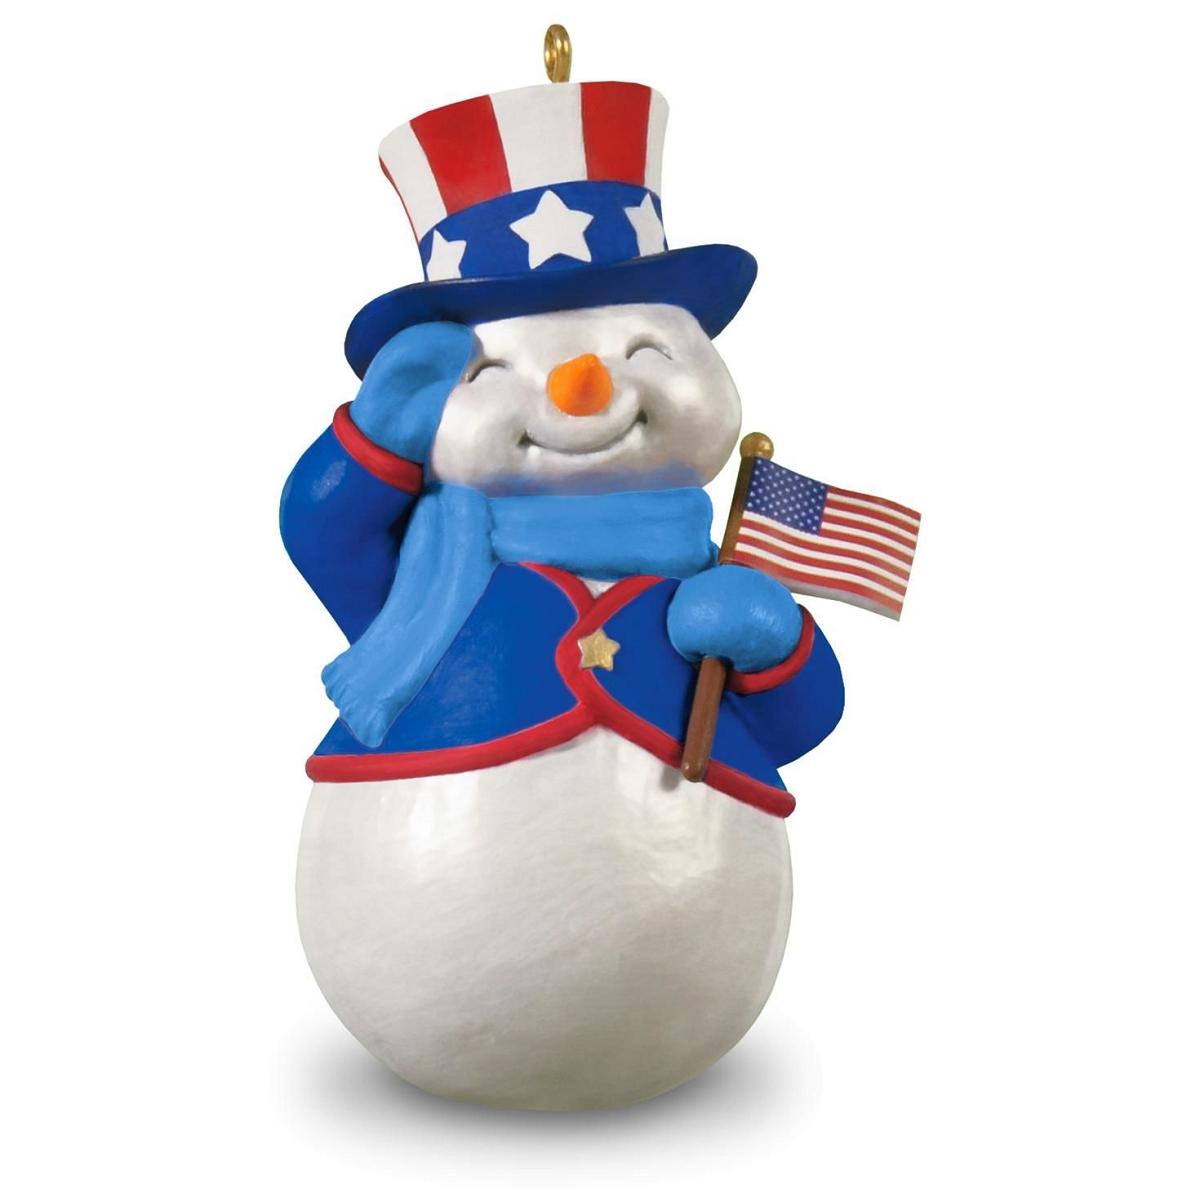 2016 patriotic snowman hallmark keepsake ornament hooked Hallmark usa